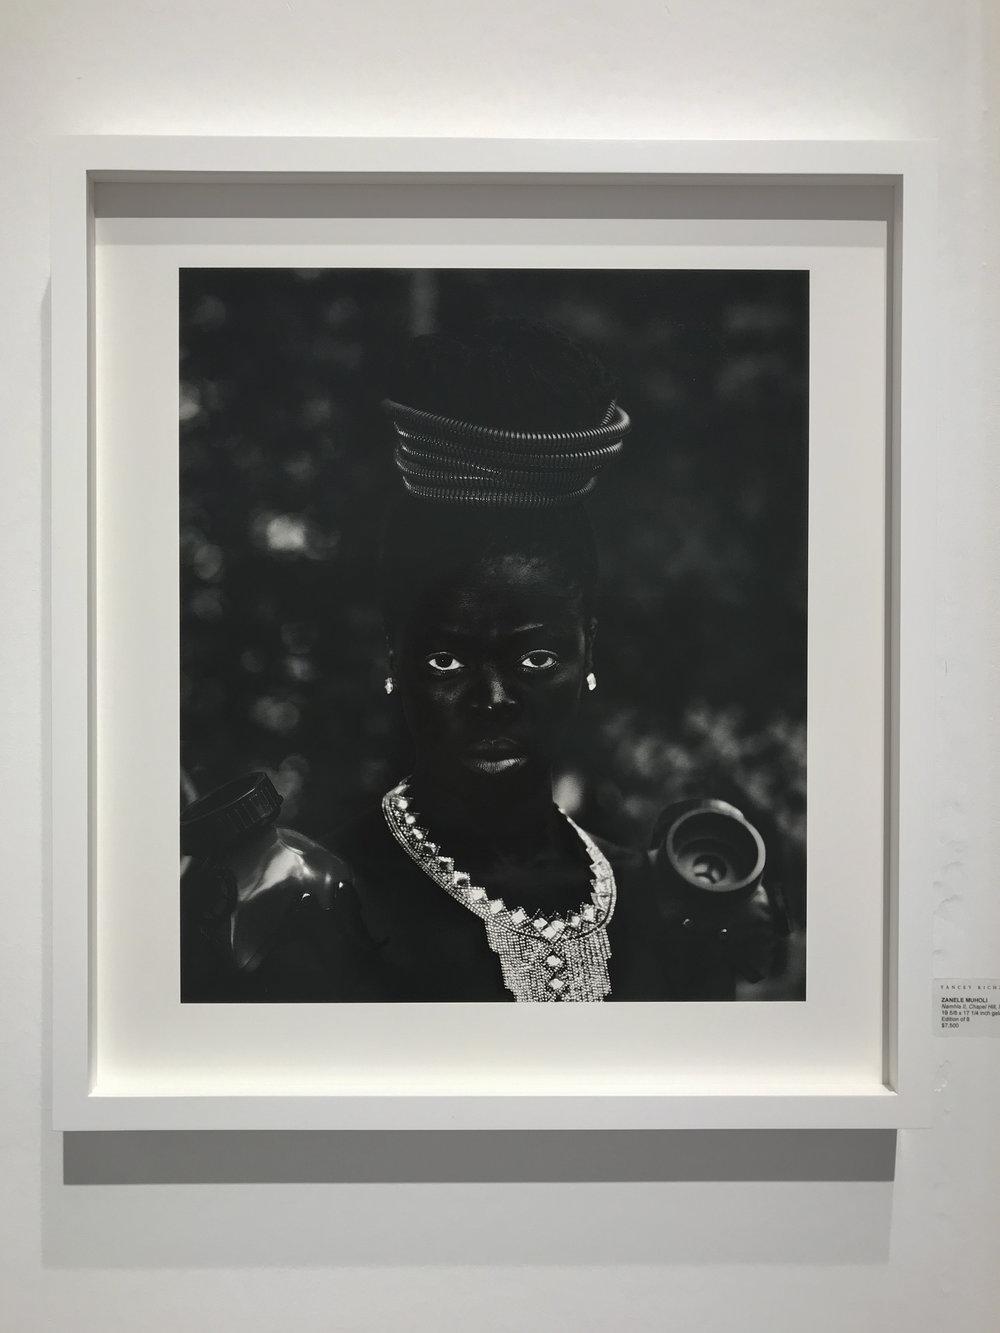 Zanele Muholi,  Namhla II, Chapel Hill, North Carolina , 2016, gelatin silver print, 19 5/8 x 17 1/4 inches